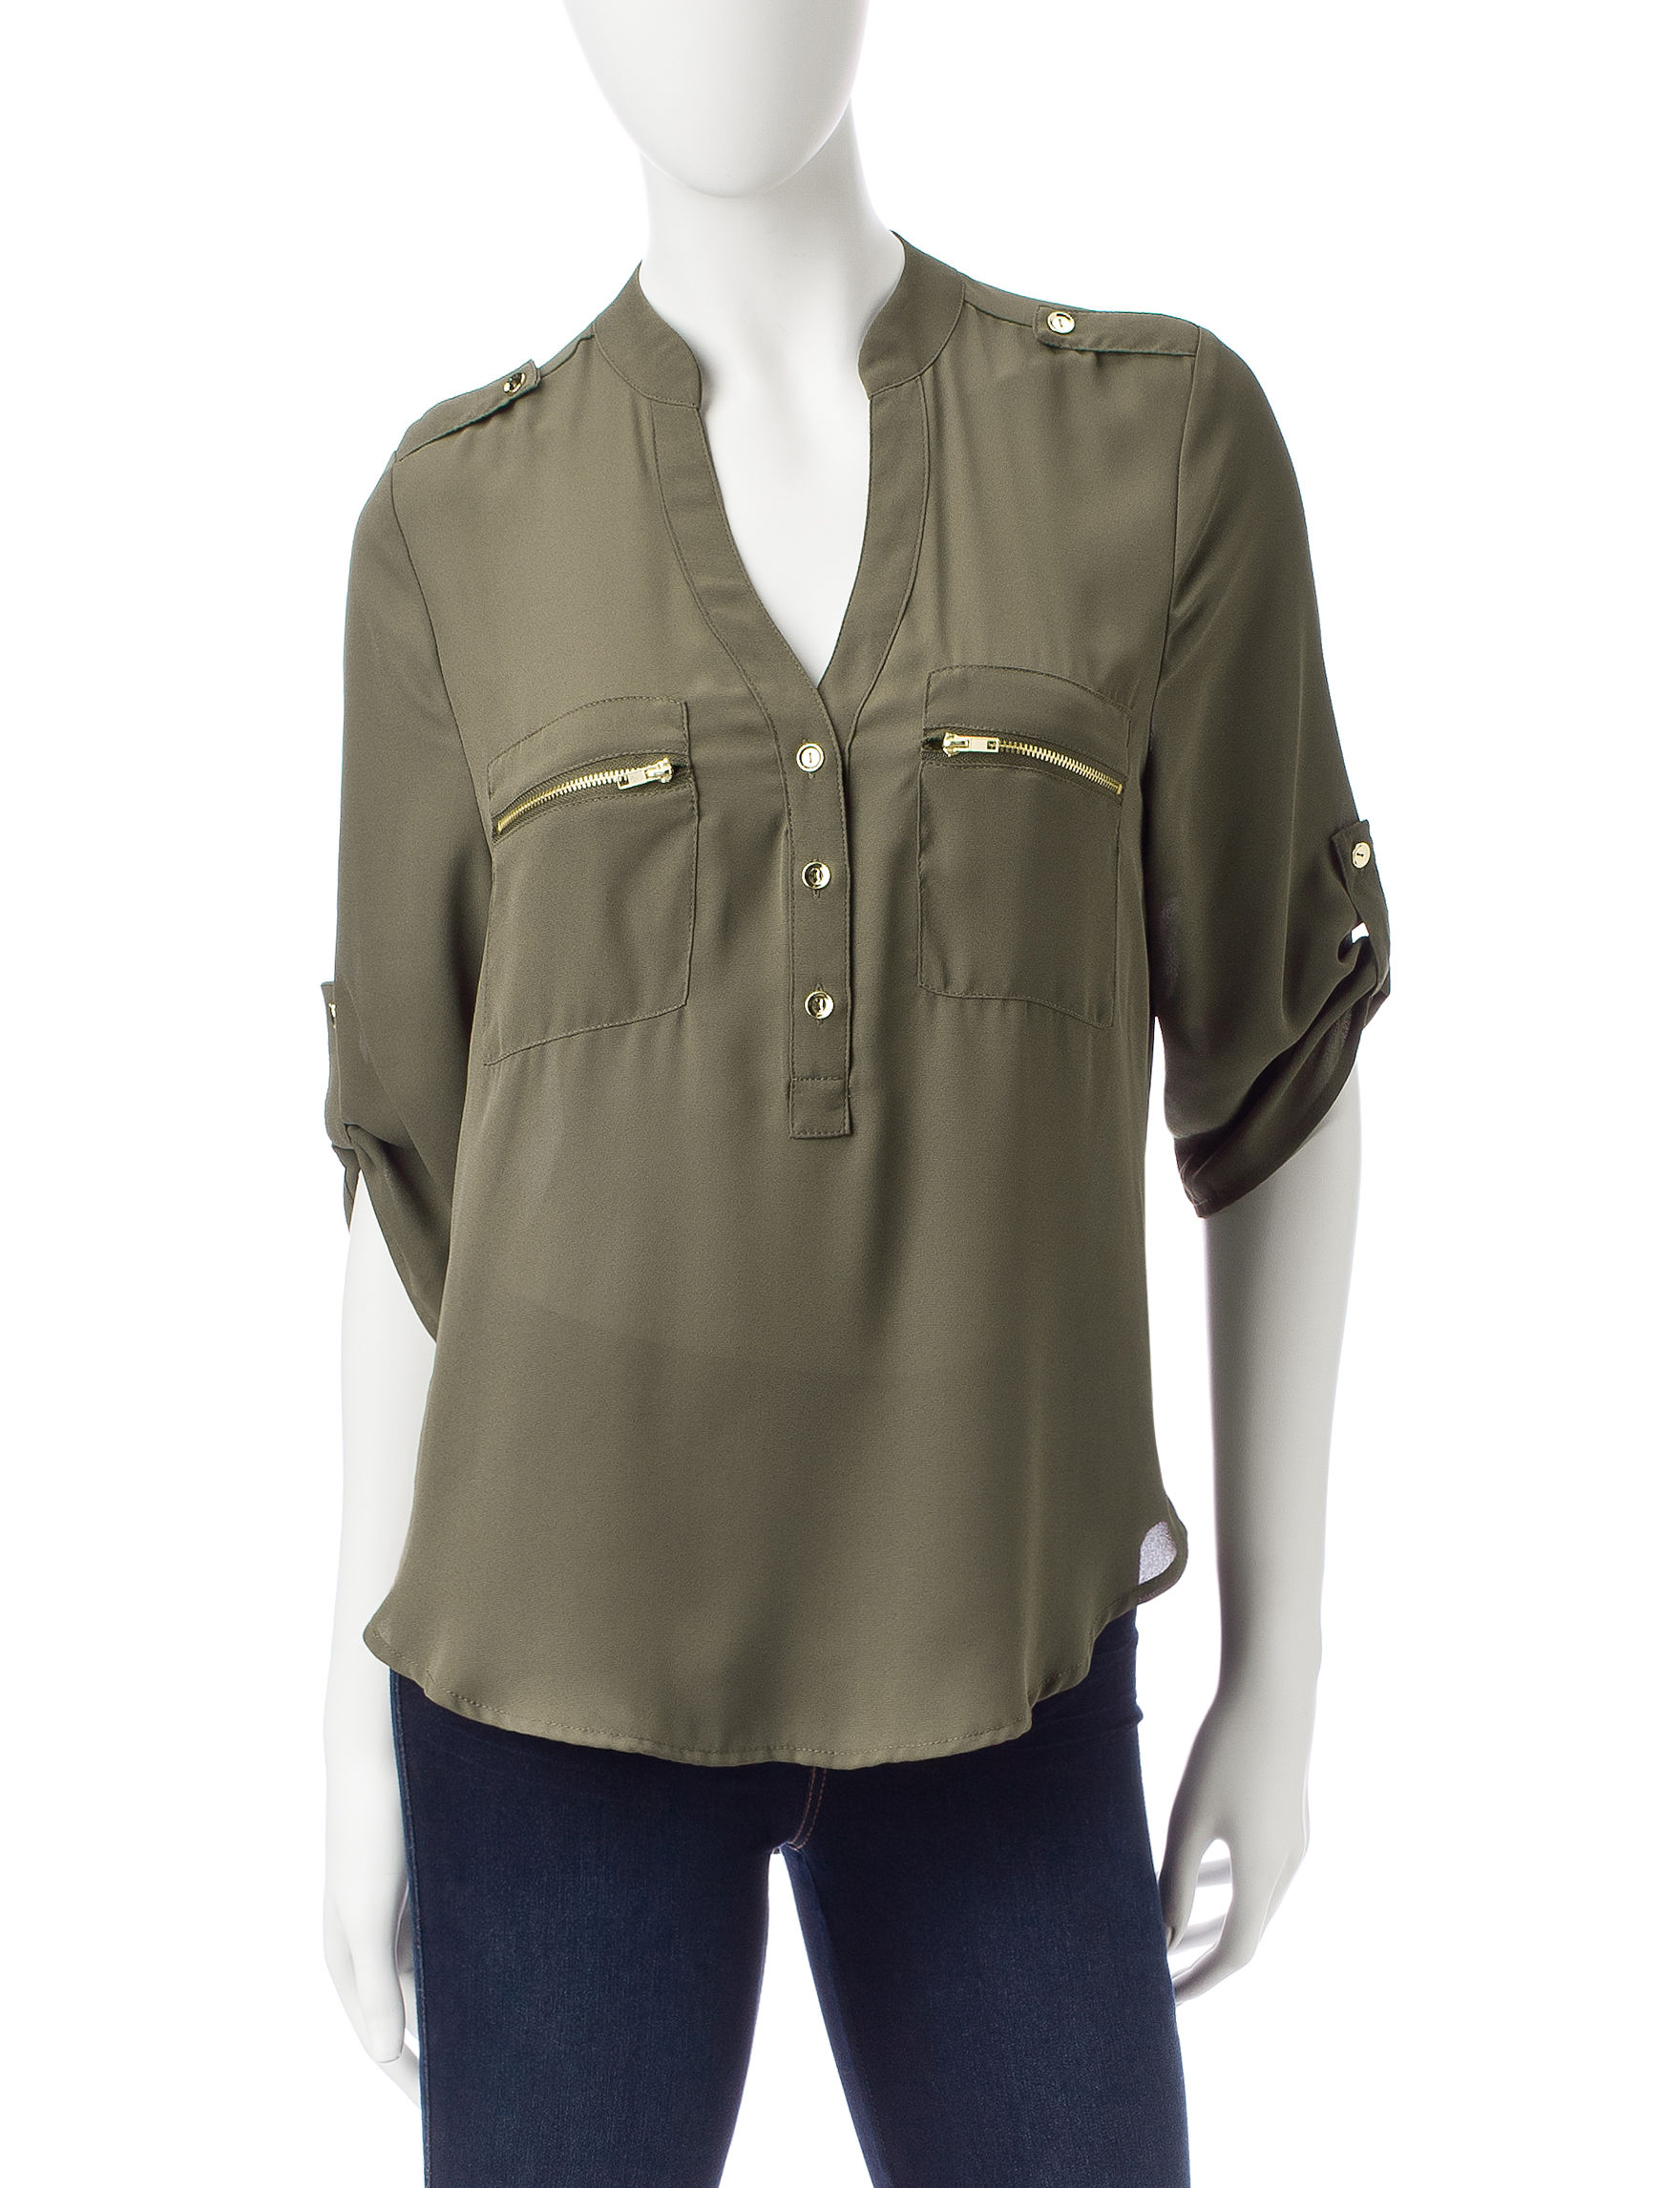 Wishful Park Olive Green Shirts & Blouses